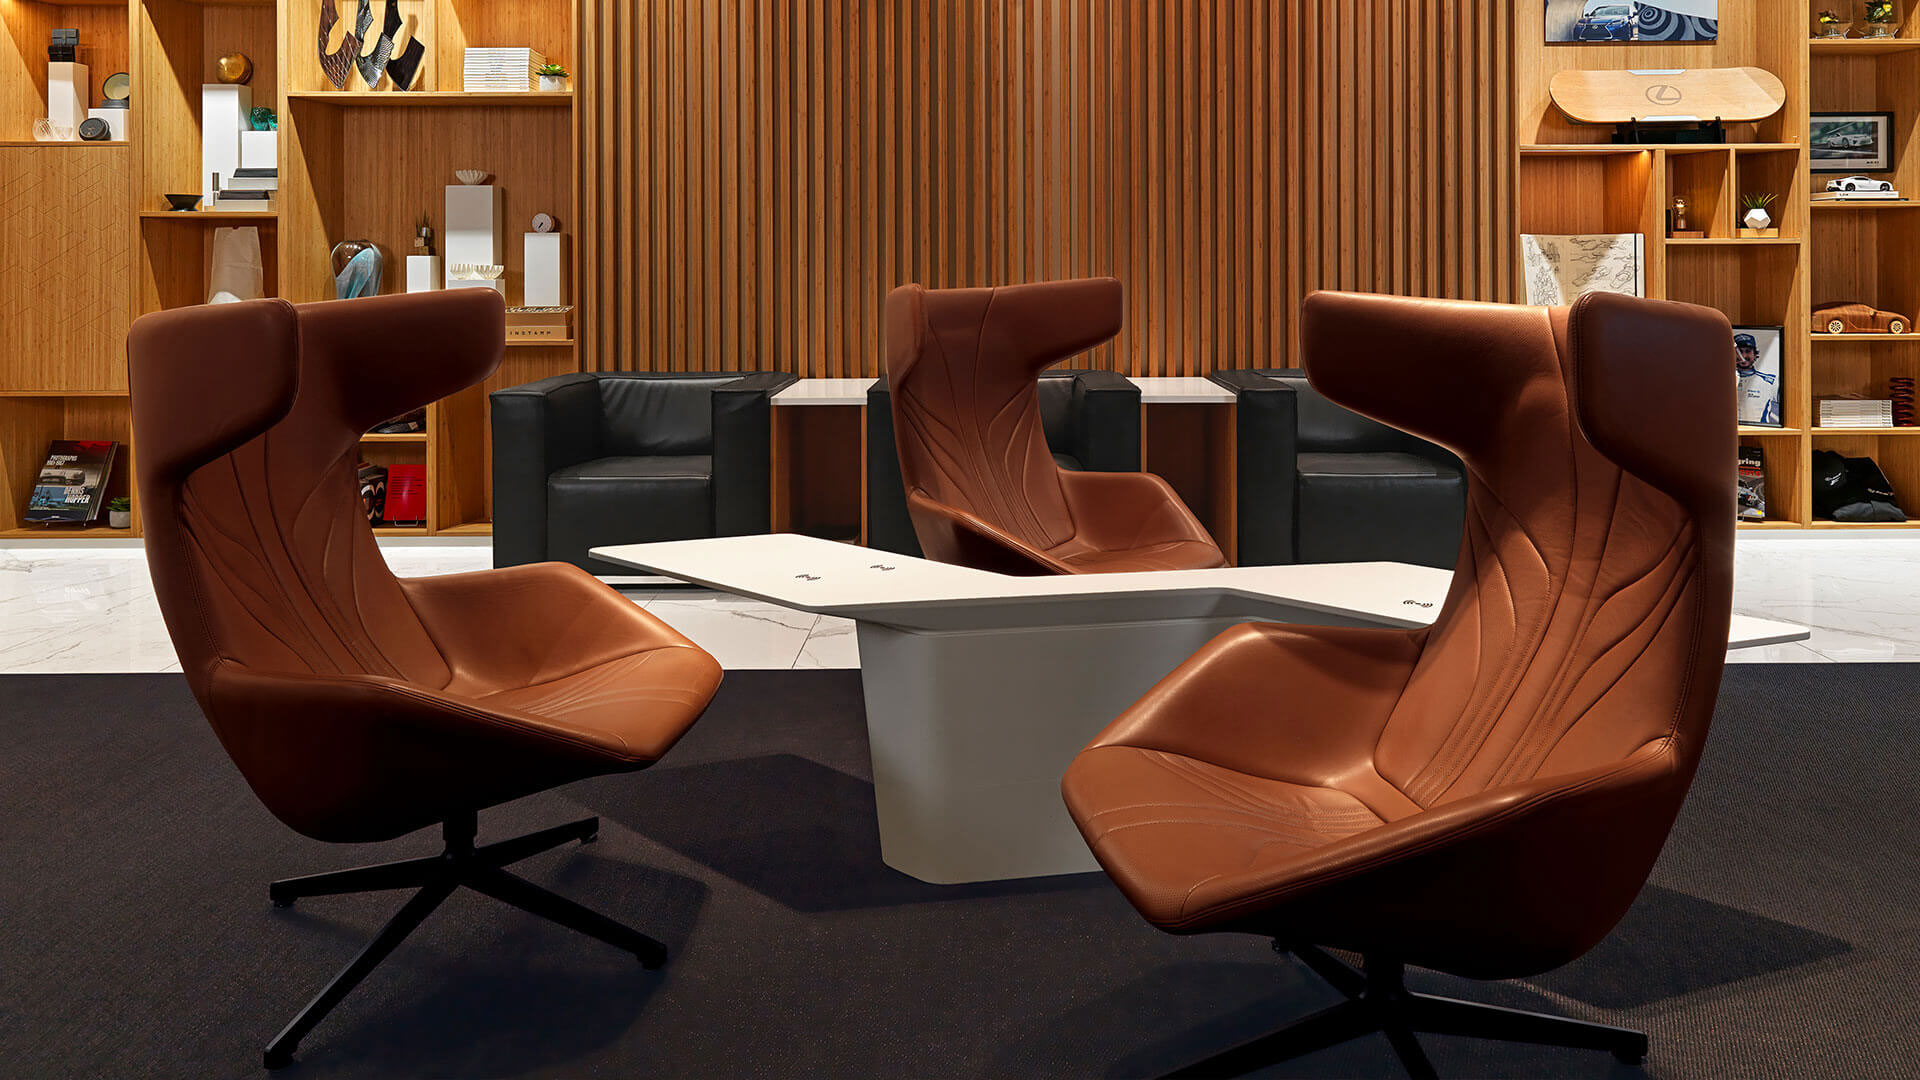 Moroso Stühle im Loft by Lexus